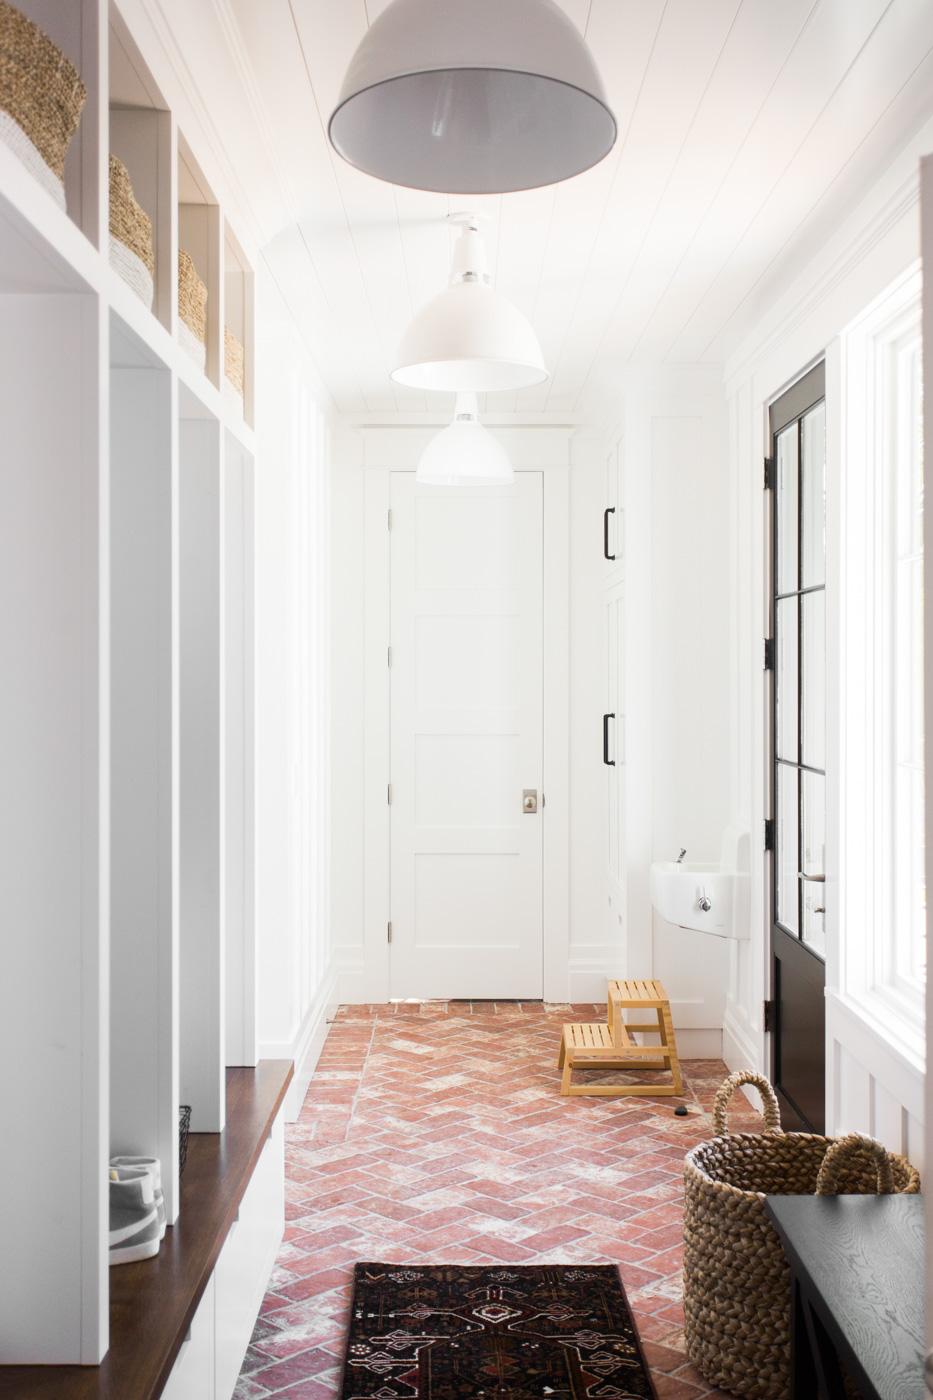 Brick+herringbone+and+board-and-batten+walls+in+the+mudroom+||+Studio+McGee.jpg